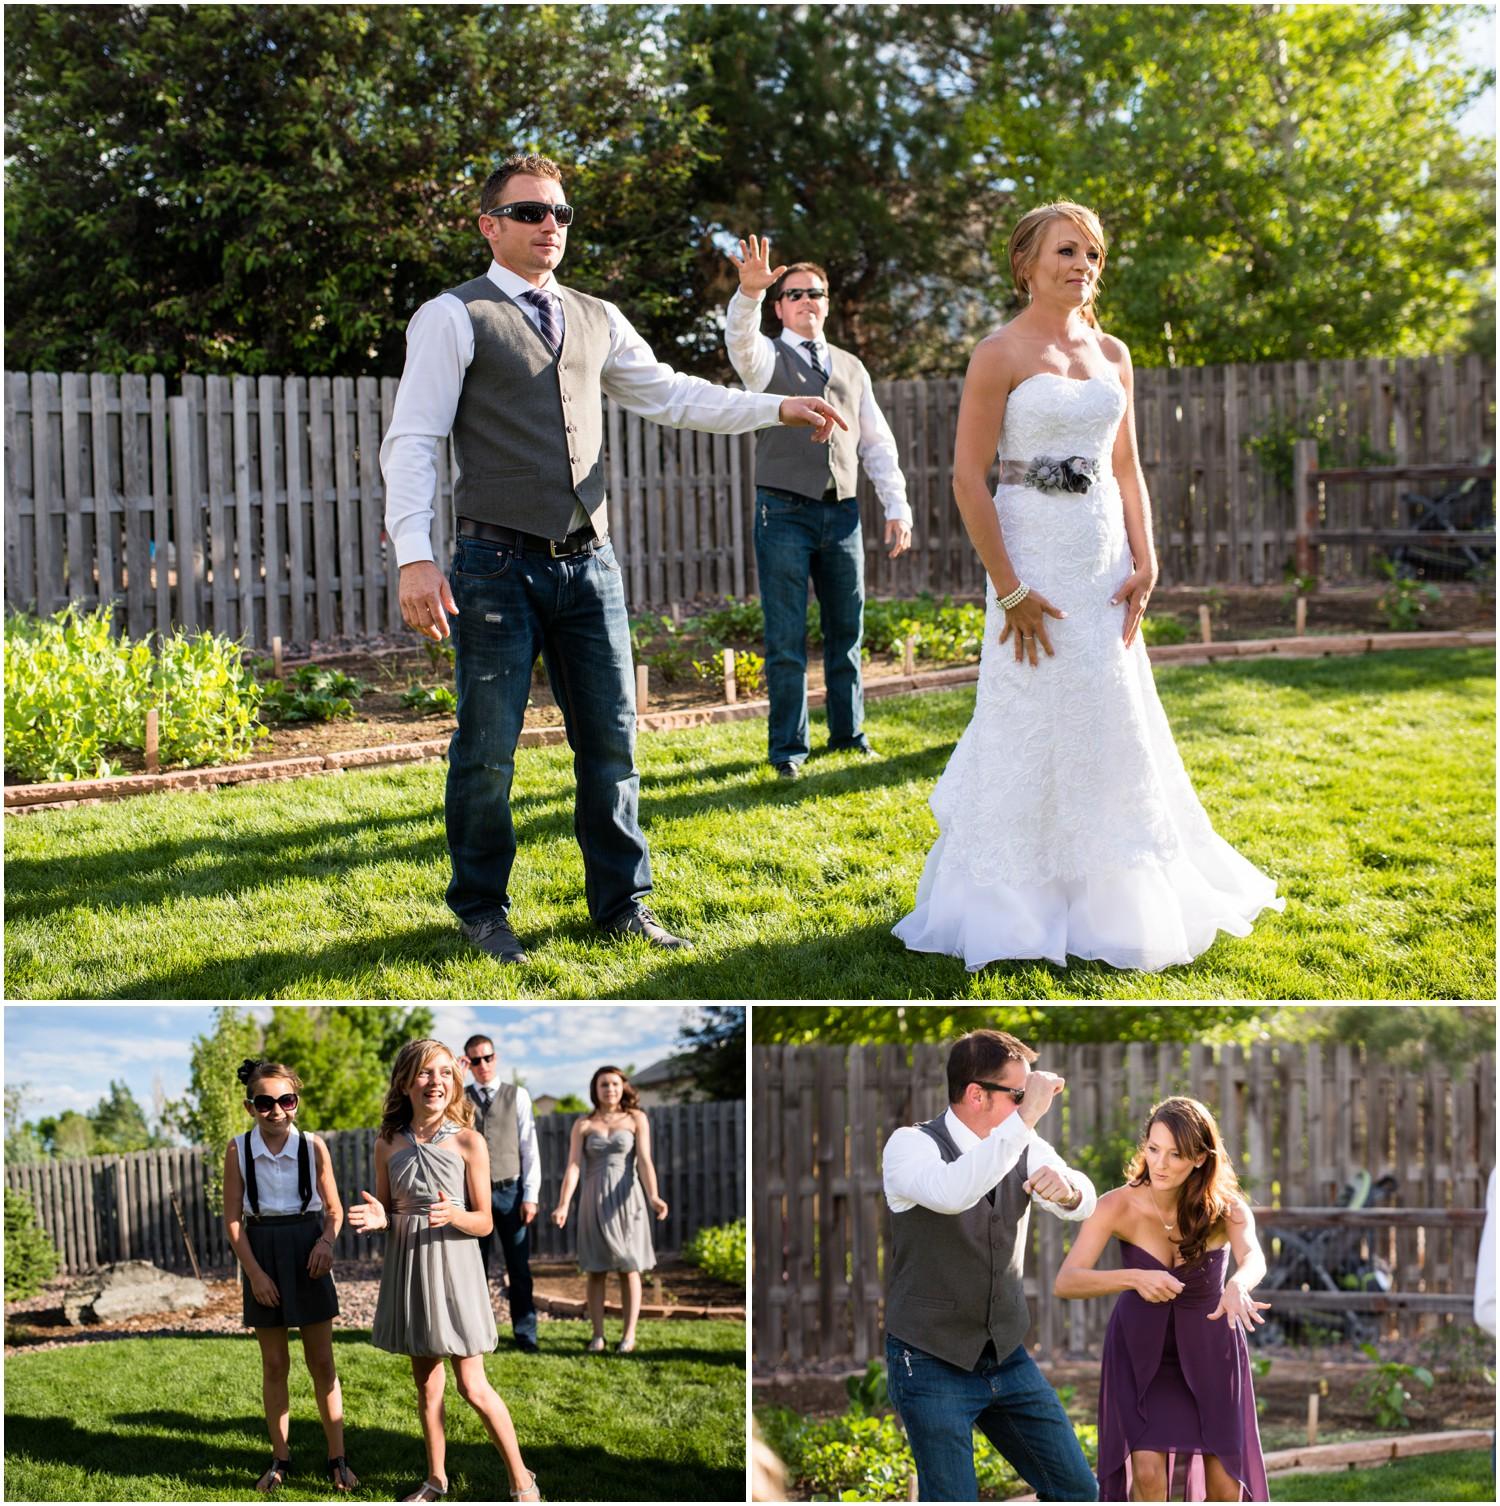 Windsor-colorado-backyard-wedding-photography-_0065.jpg